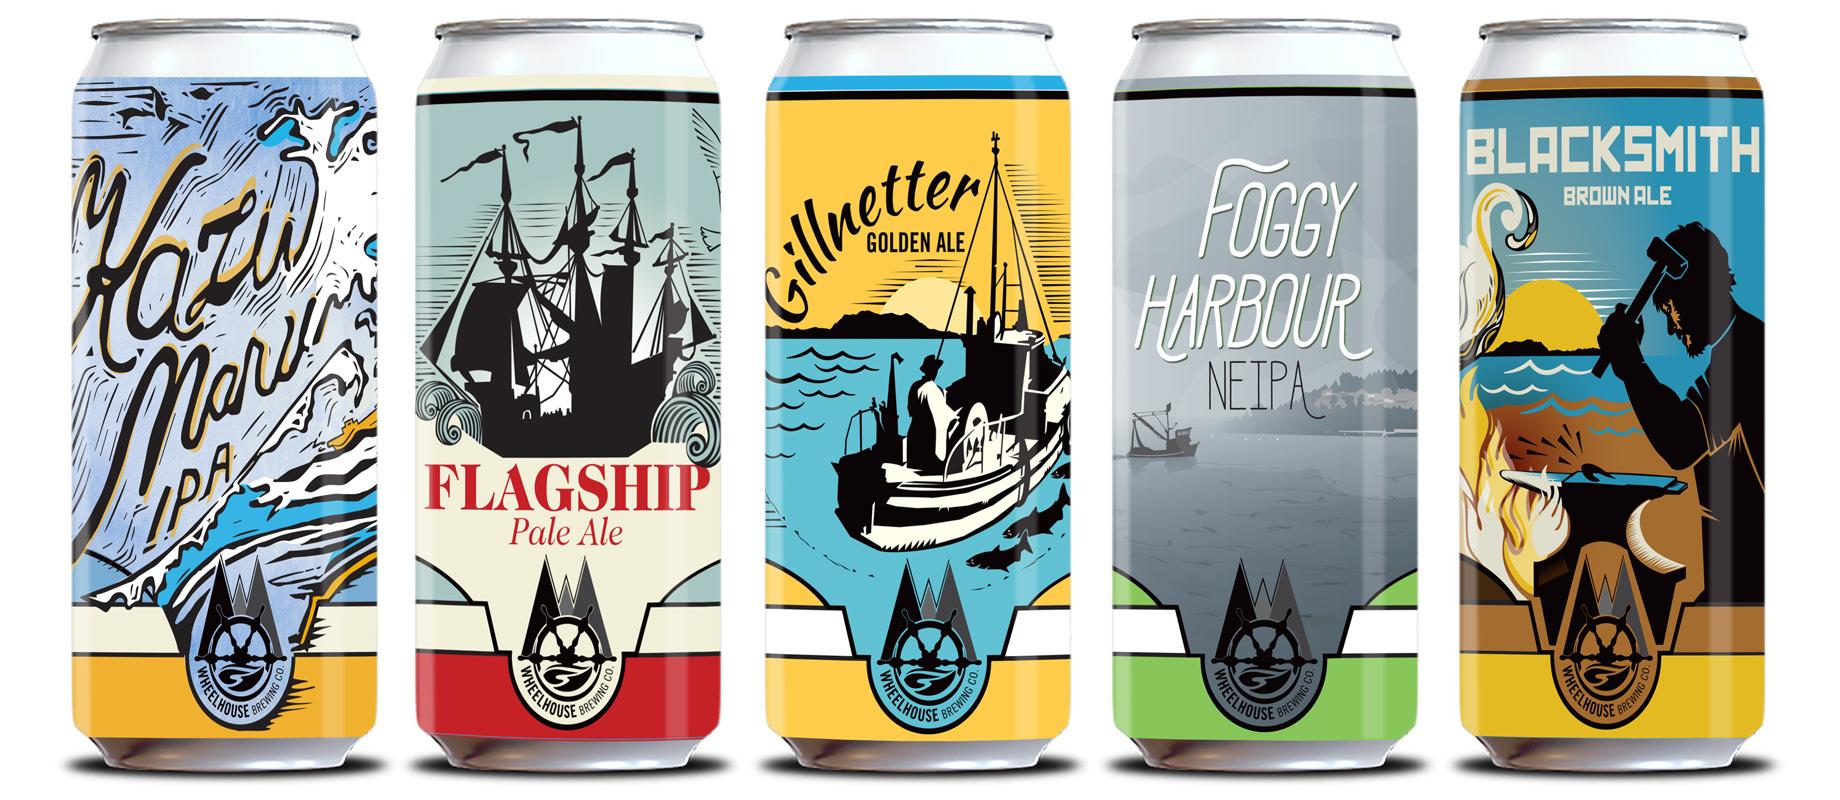 Wheelhouse Brewing Co. can designs